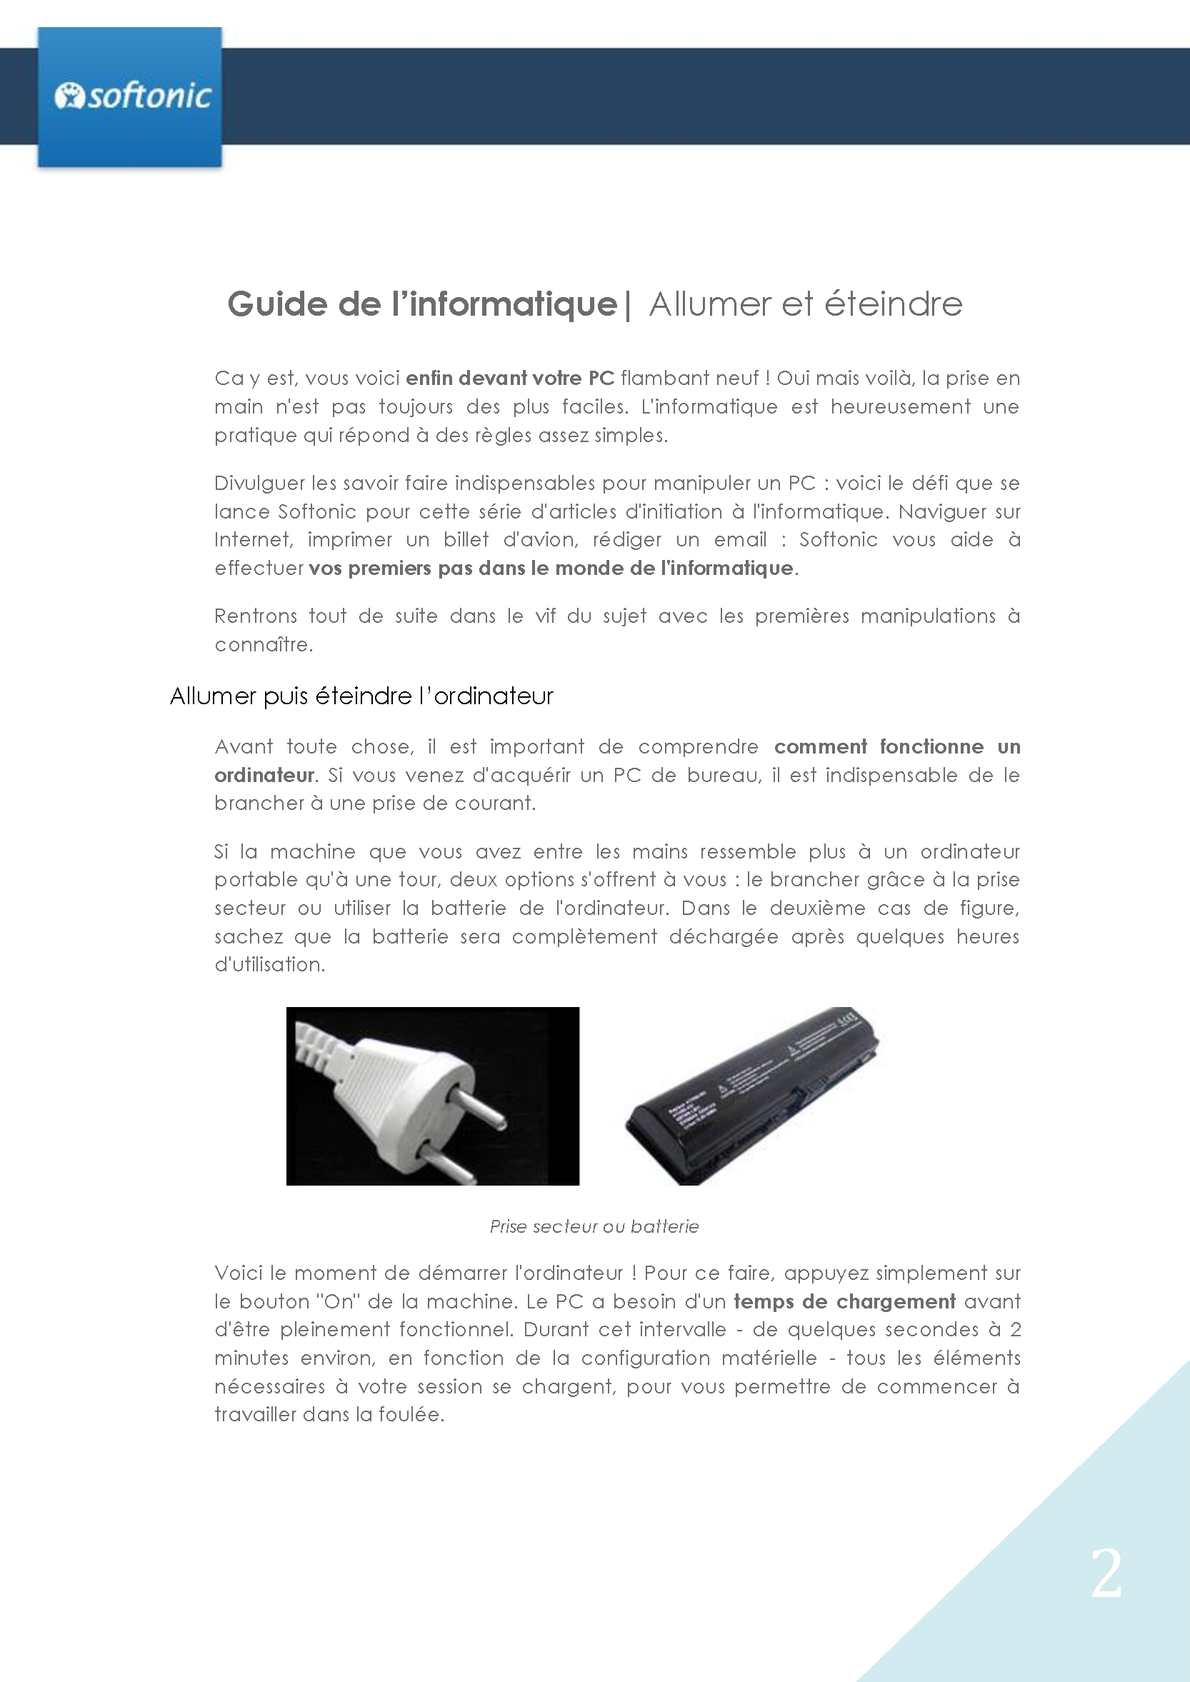 Le guide de l'informatique - CALAMEO Downloader